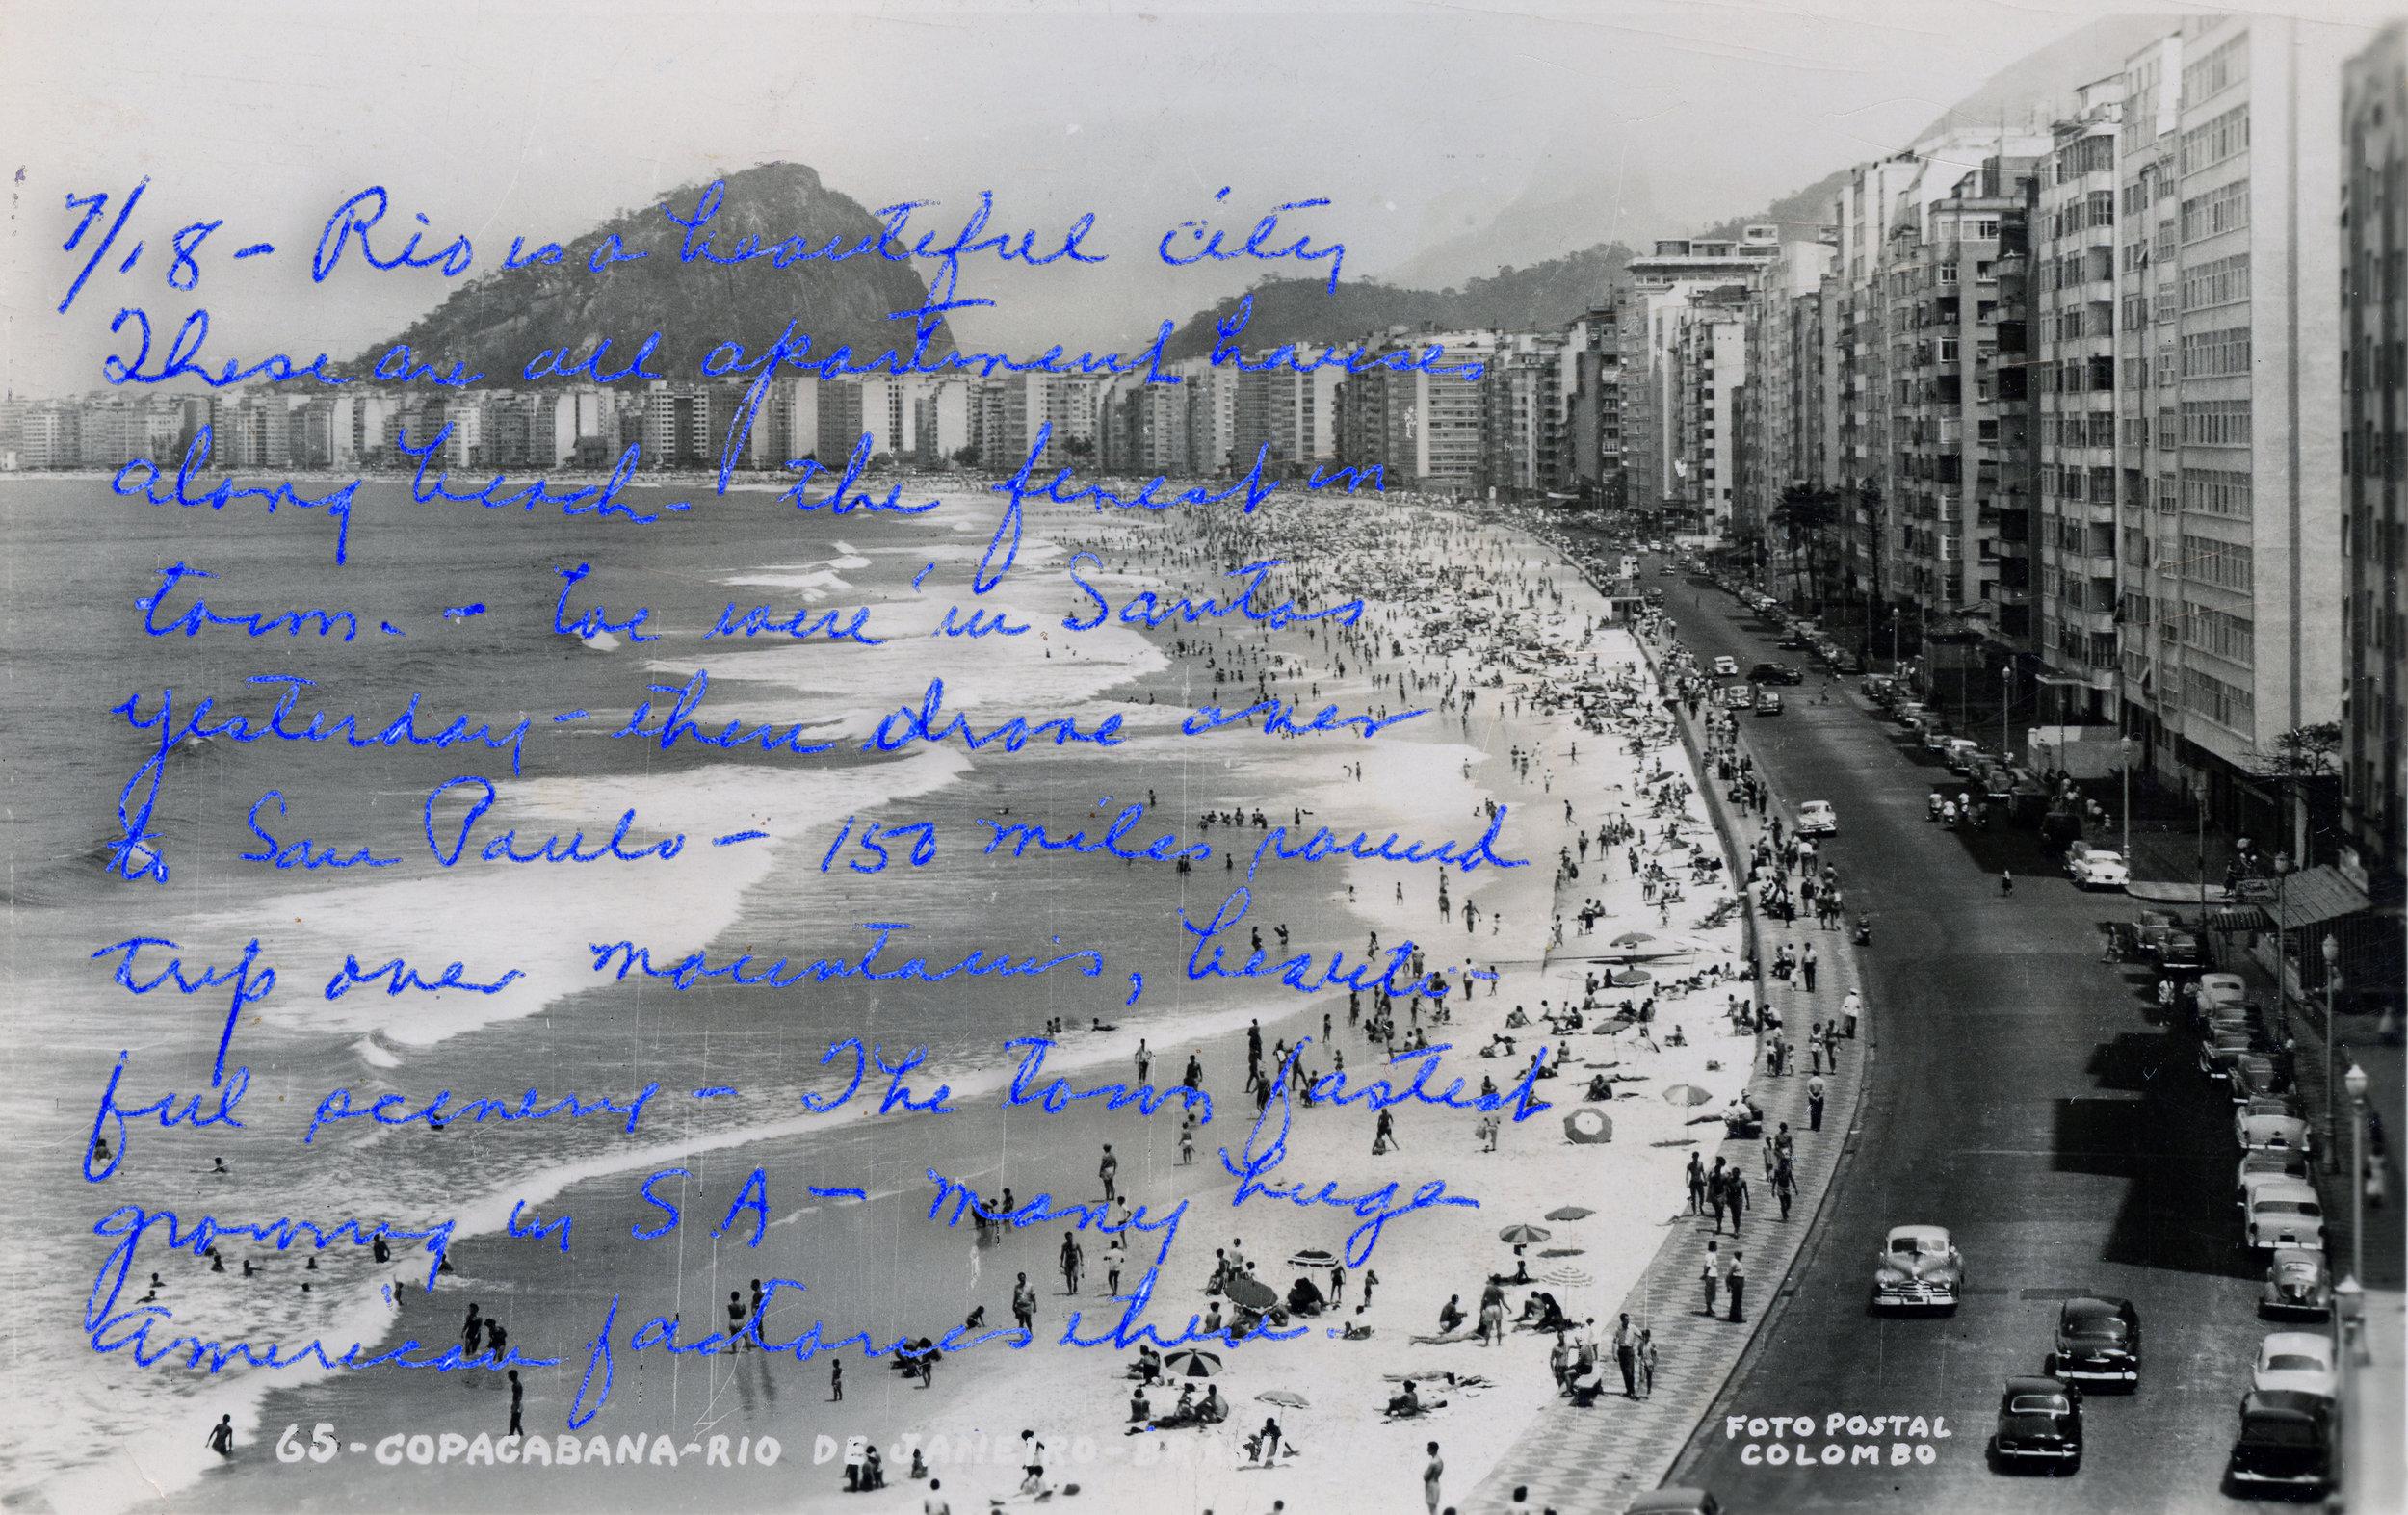 Mr. & Mrs. Schlobohm    photochrome postcard, 1933